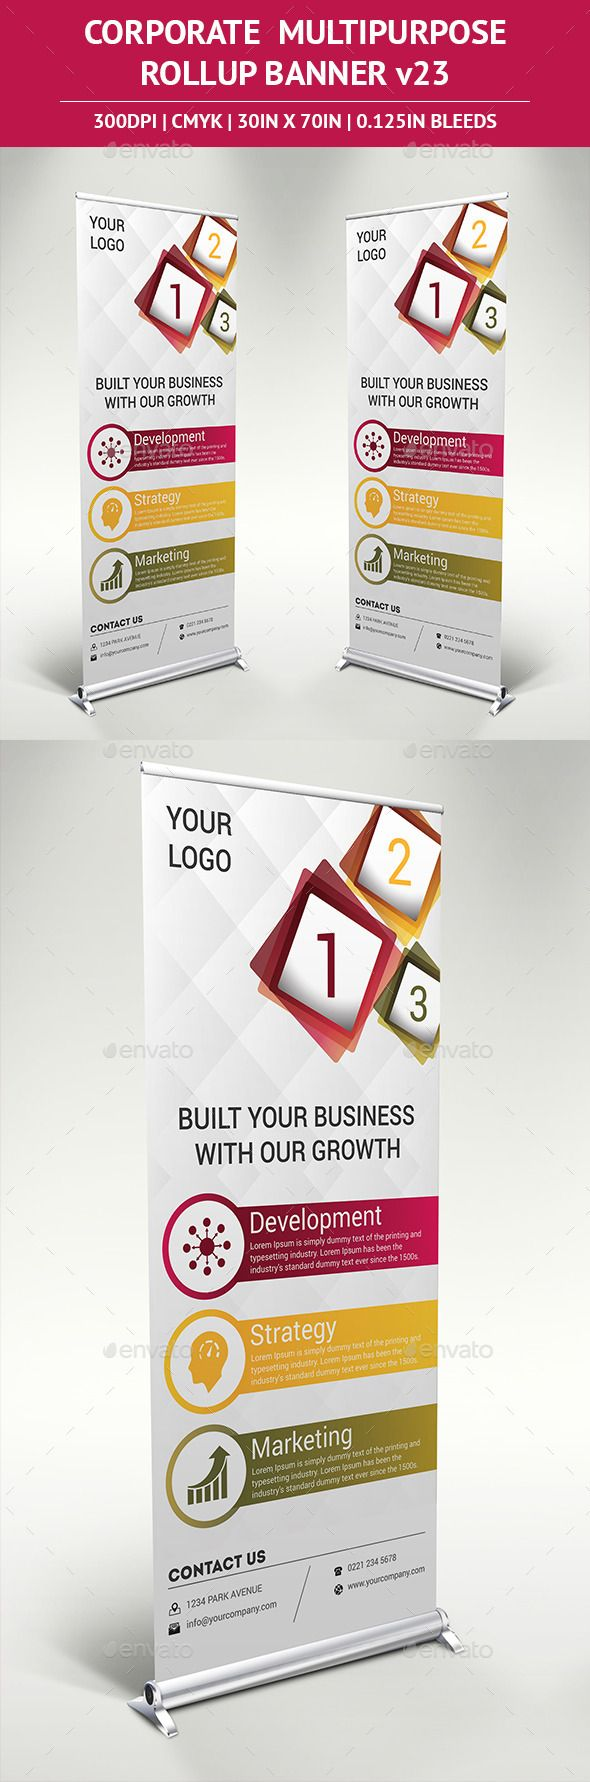 Rollup Banner Template #design Download: http://graphicriver.net/item/rollup-banner-vol-23/11458396?ref=ksioks